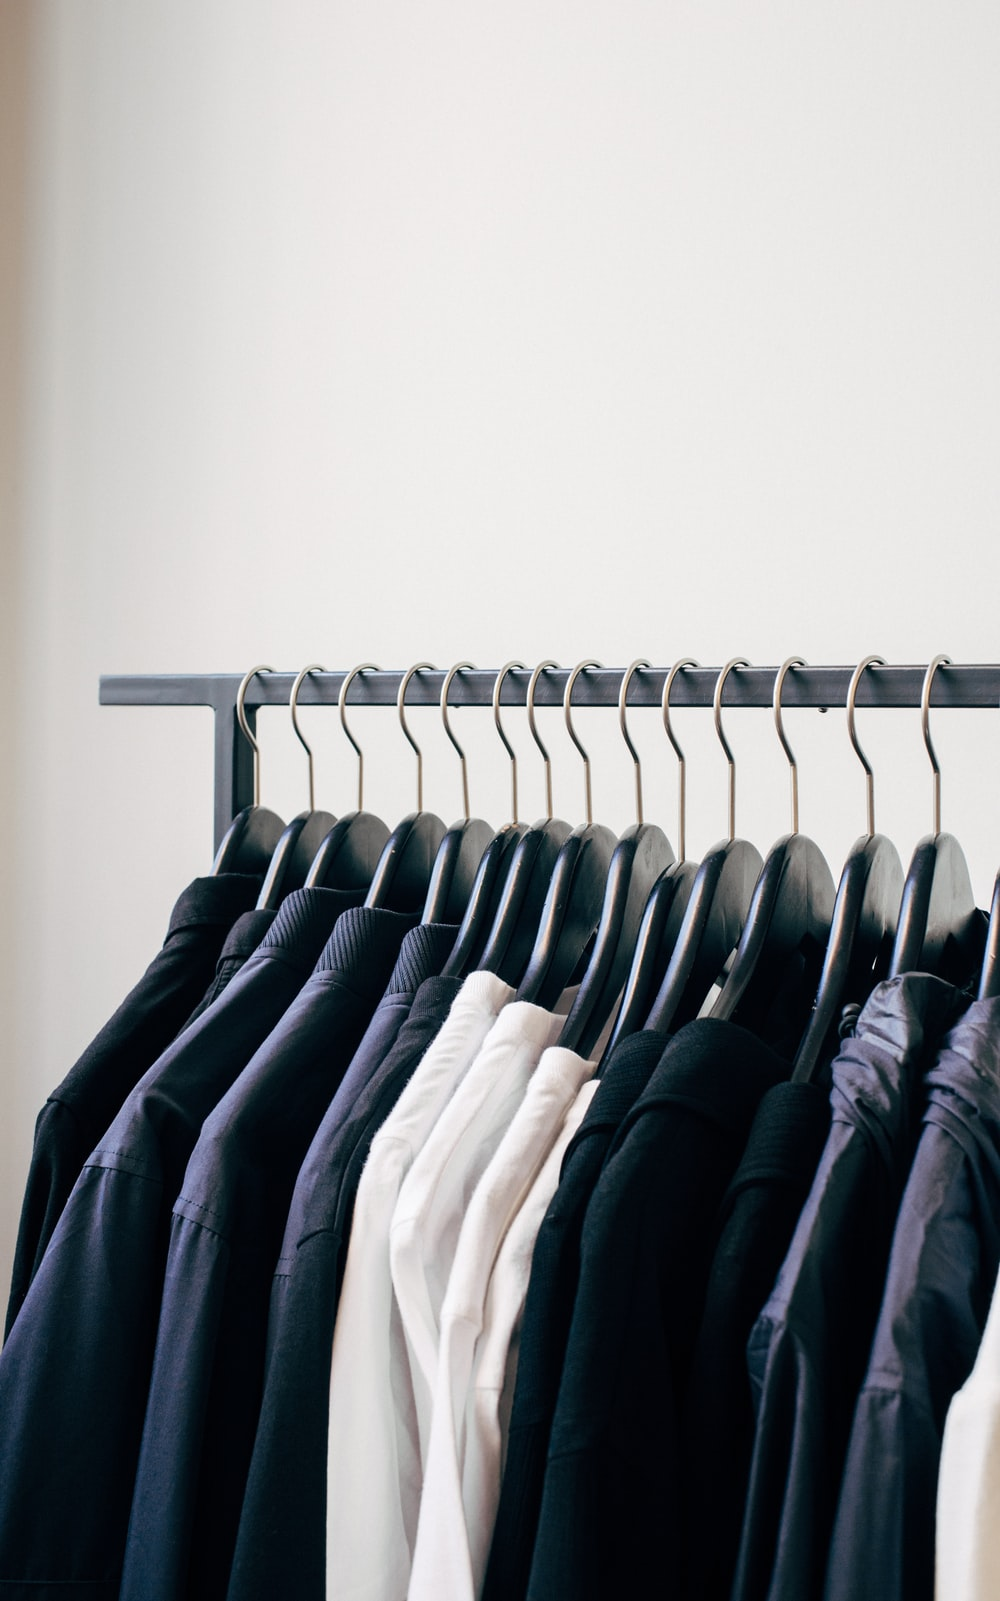 hanger of cloth lot